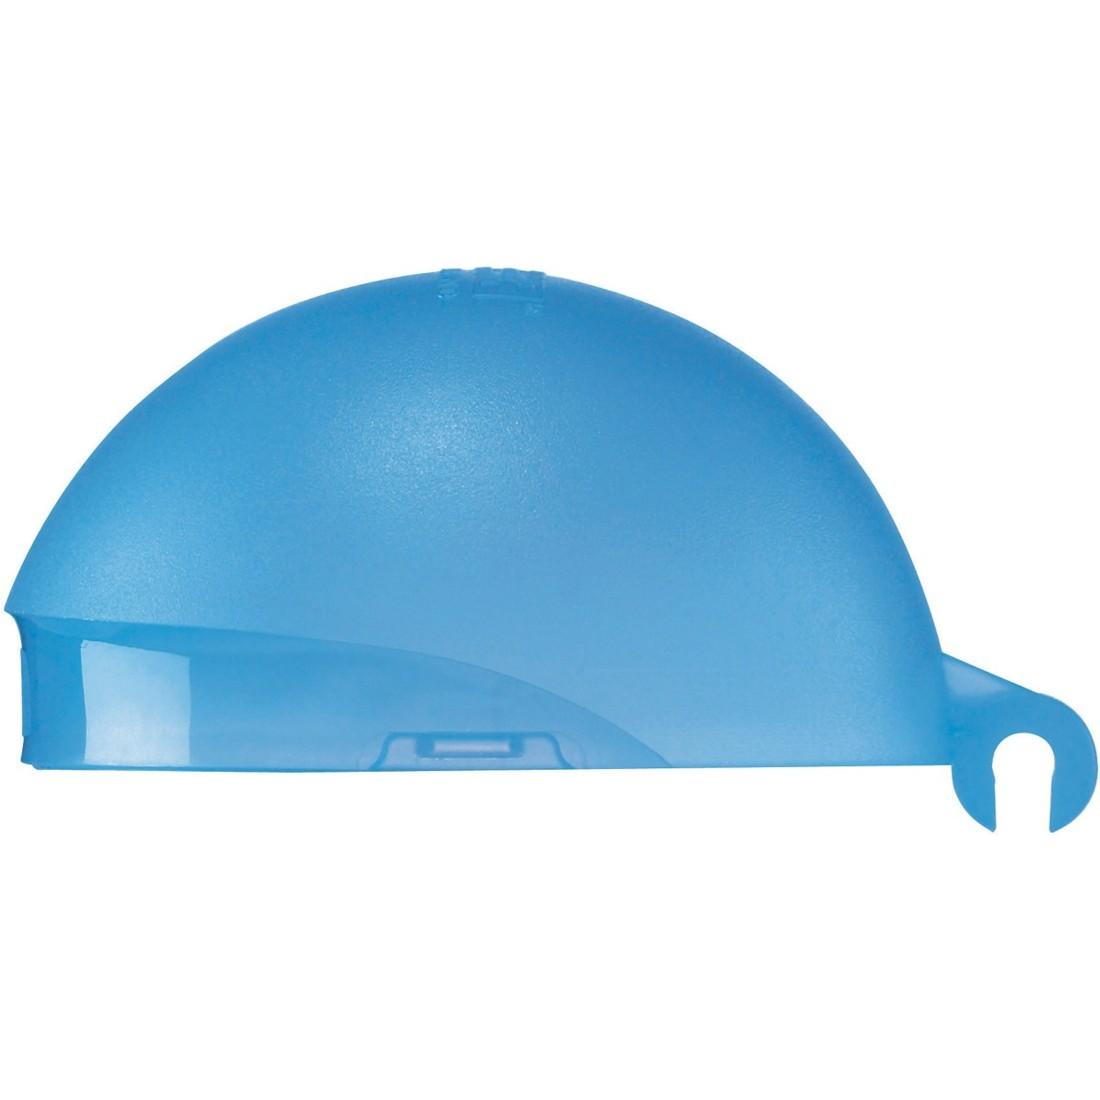 SIGG Ersatzkappe Active Cap Blau Transparent